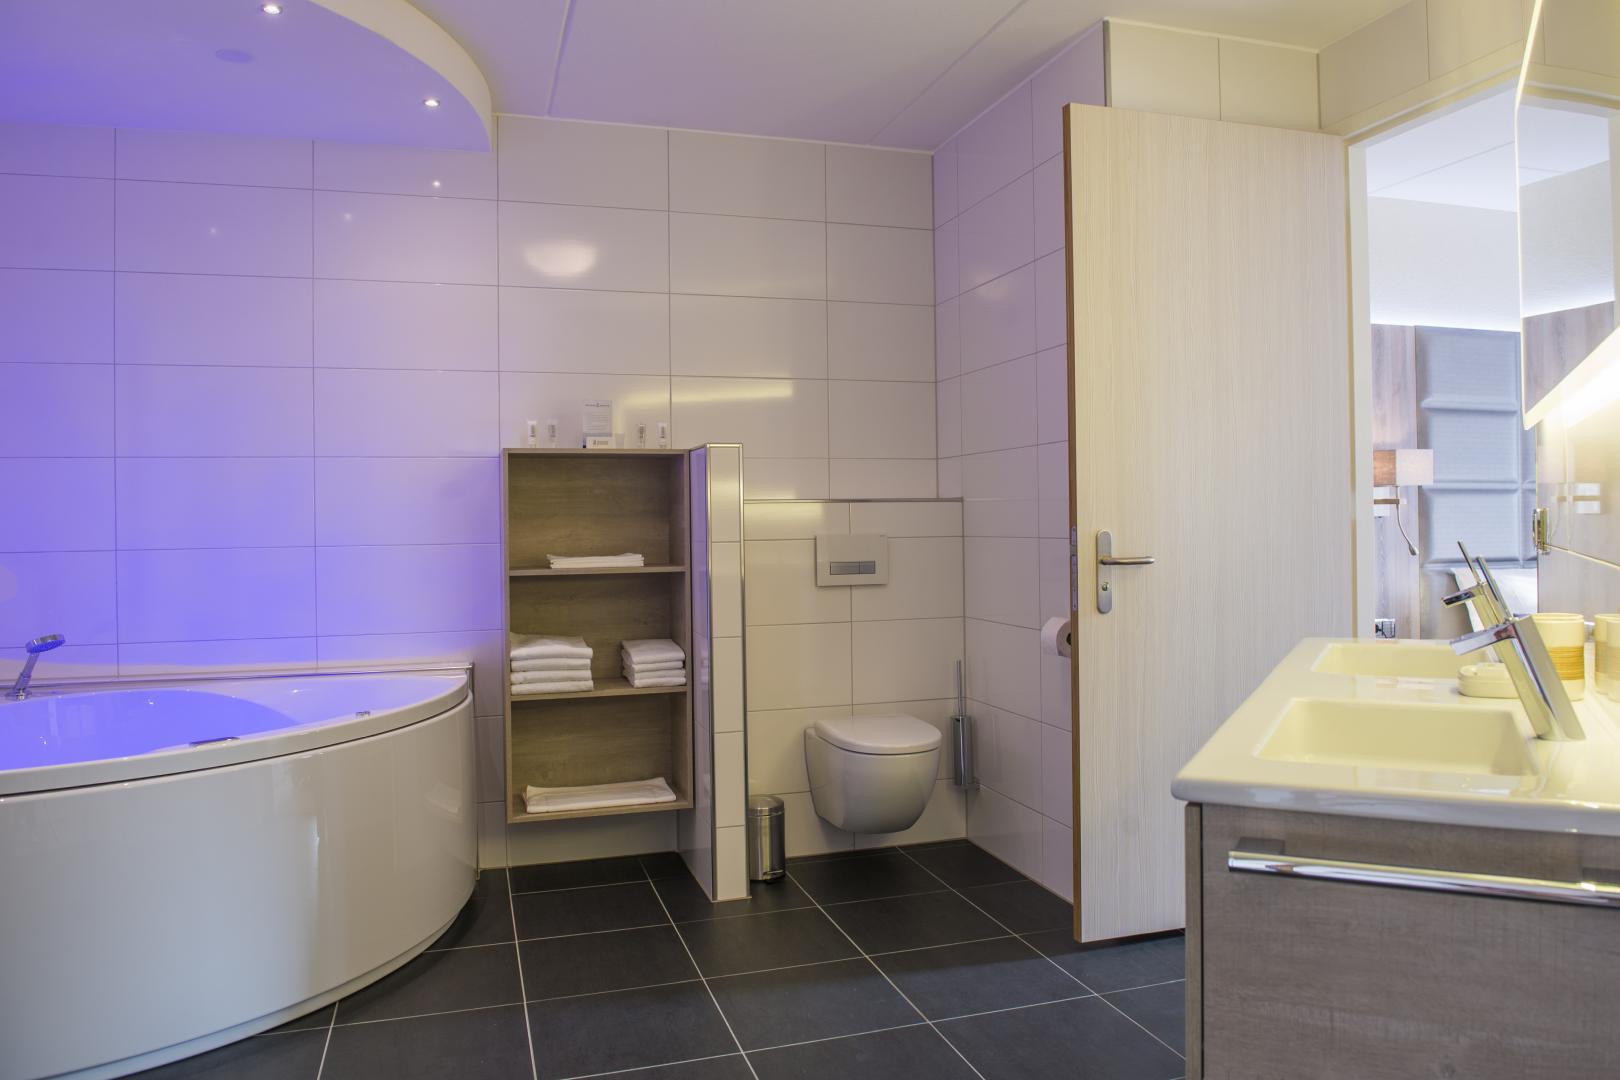 Marveld Tournament - Hotel Havezate Marveld - Bathroom